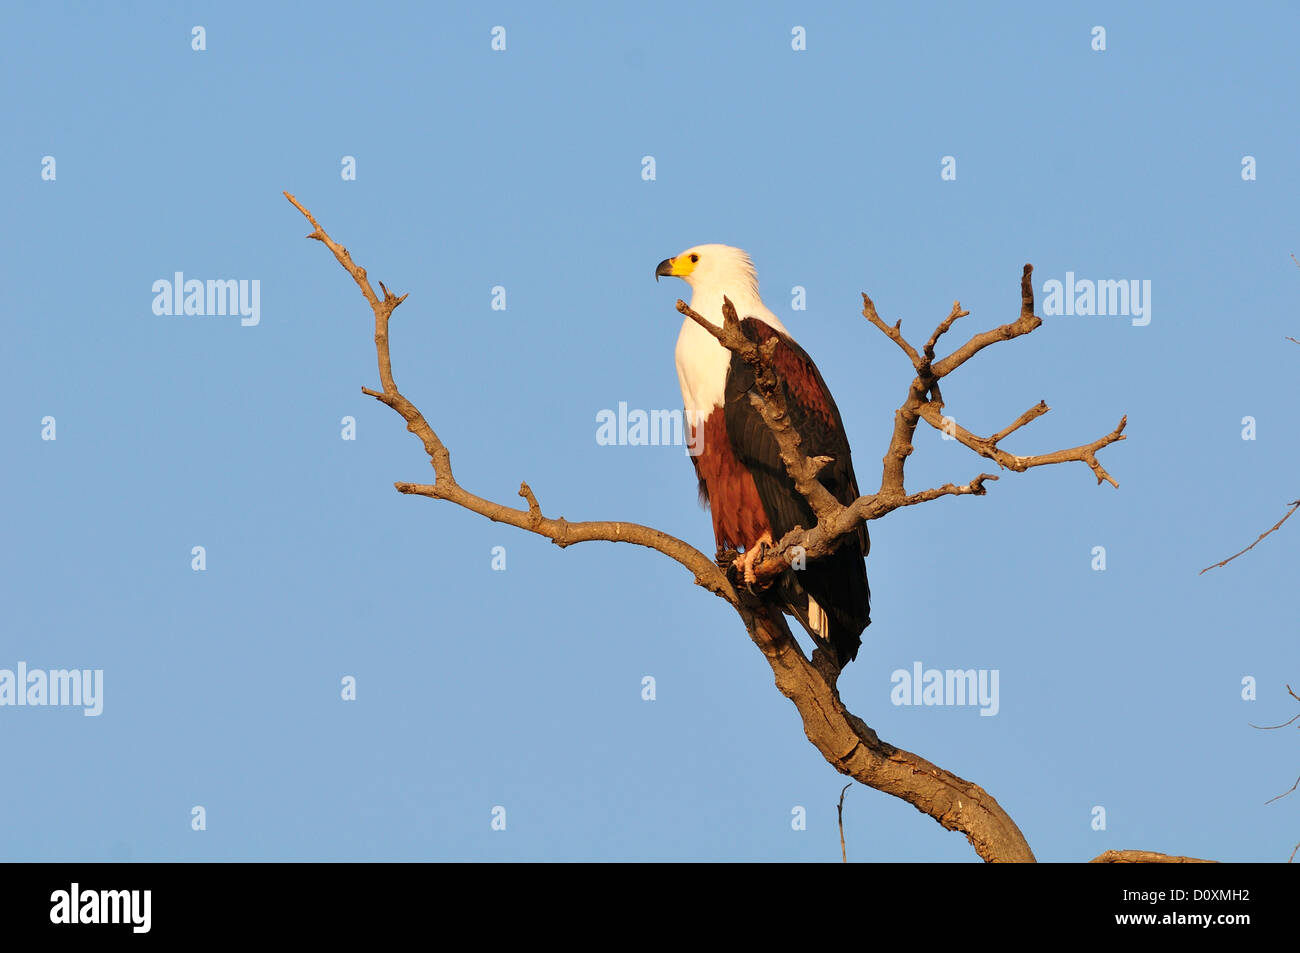 Africa, Botswana, Chobe, National Park, Fish Eagle, bird, Eagle, perch, wildlife, Haliaeetus vociferon, bird - Stock Image